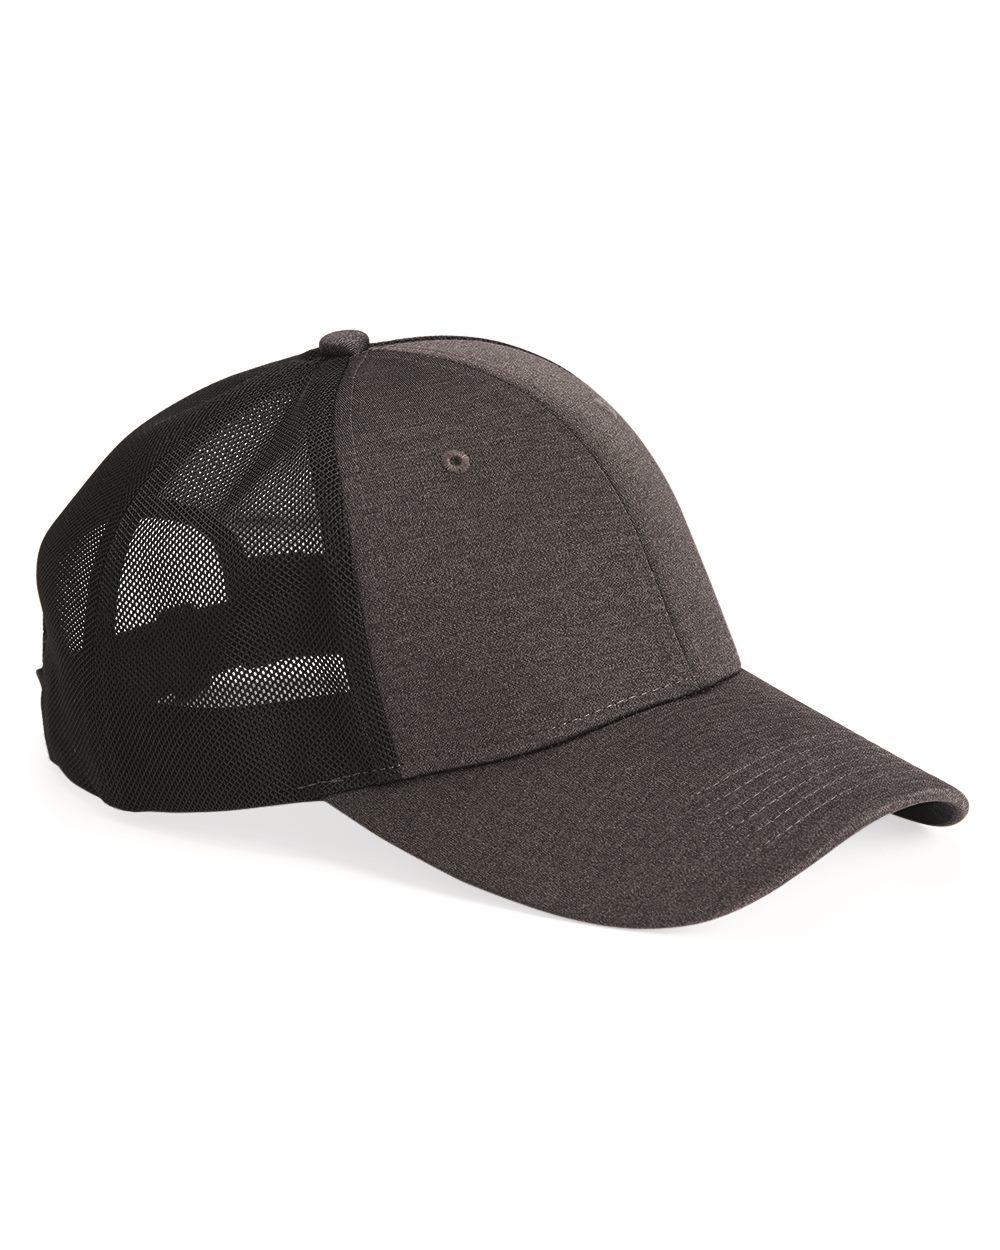 Sportsman 9310 - Marled Mesh Back Cap